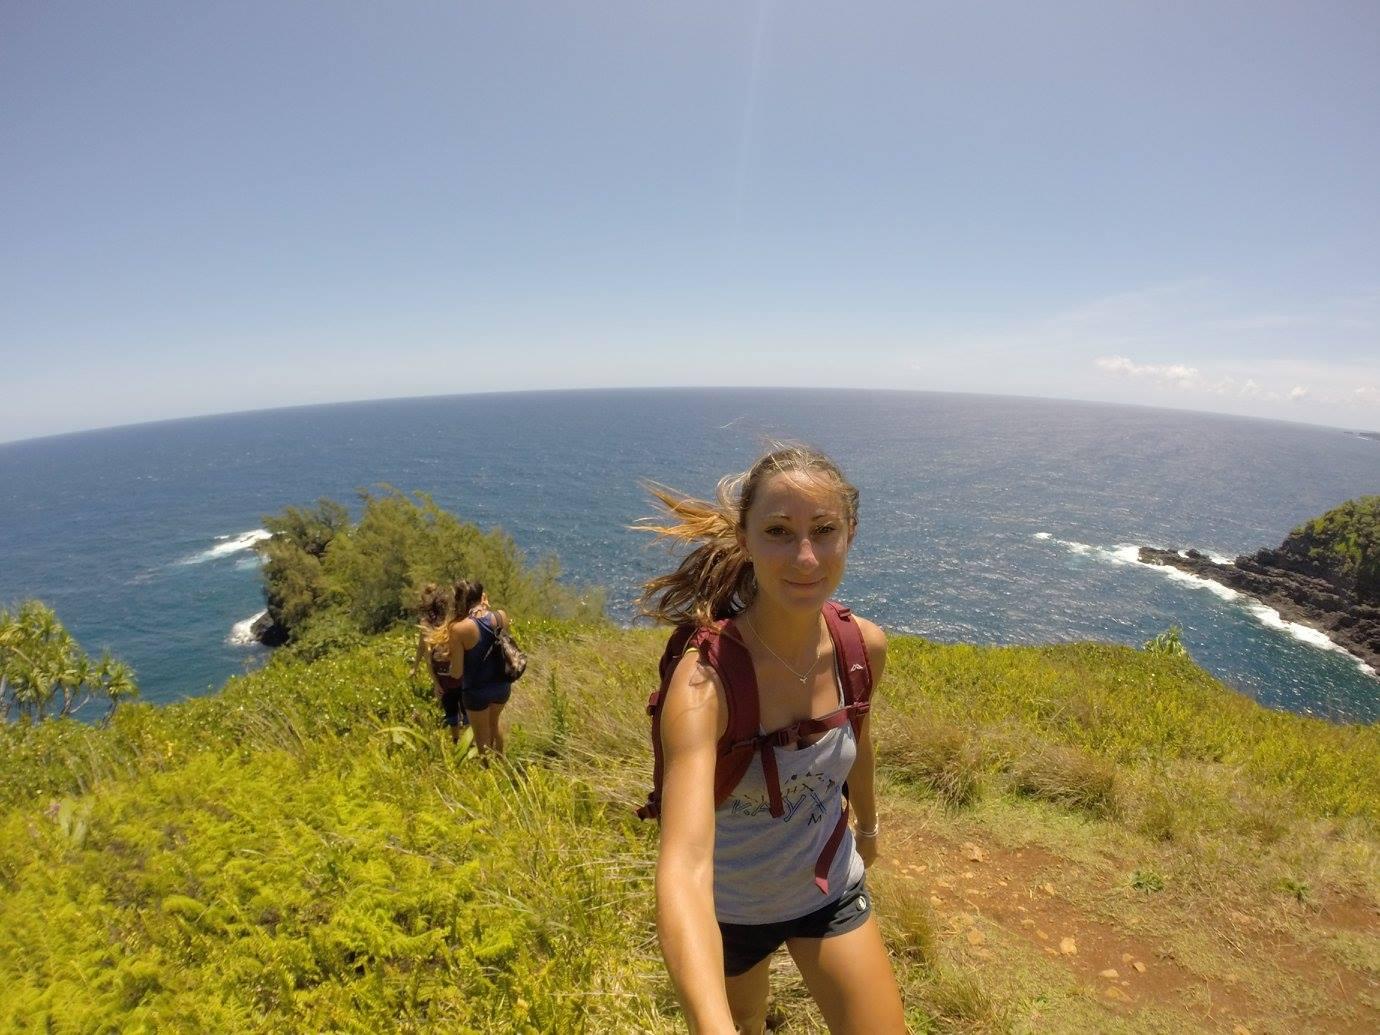 magen-tour-guide-epic-experience-maui